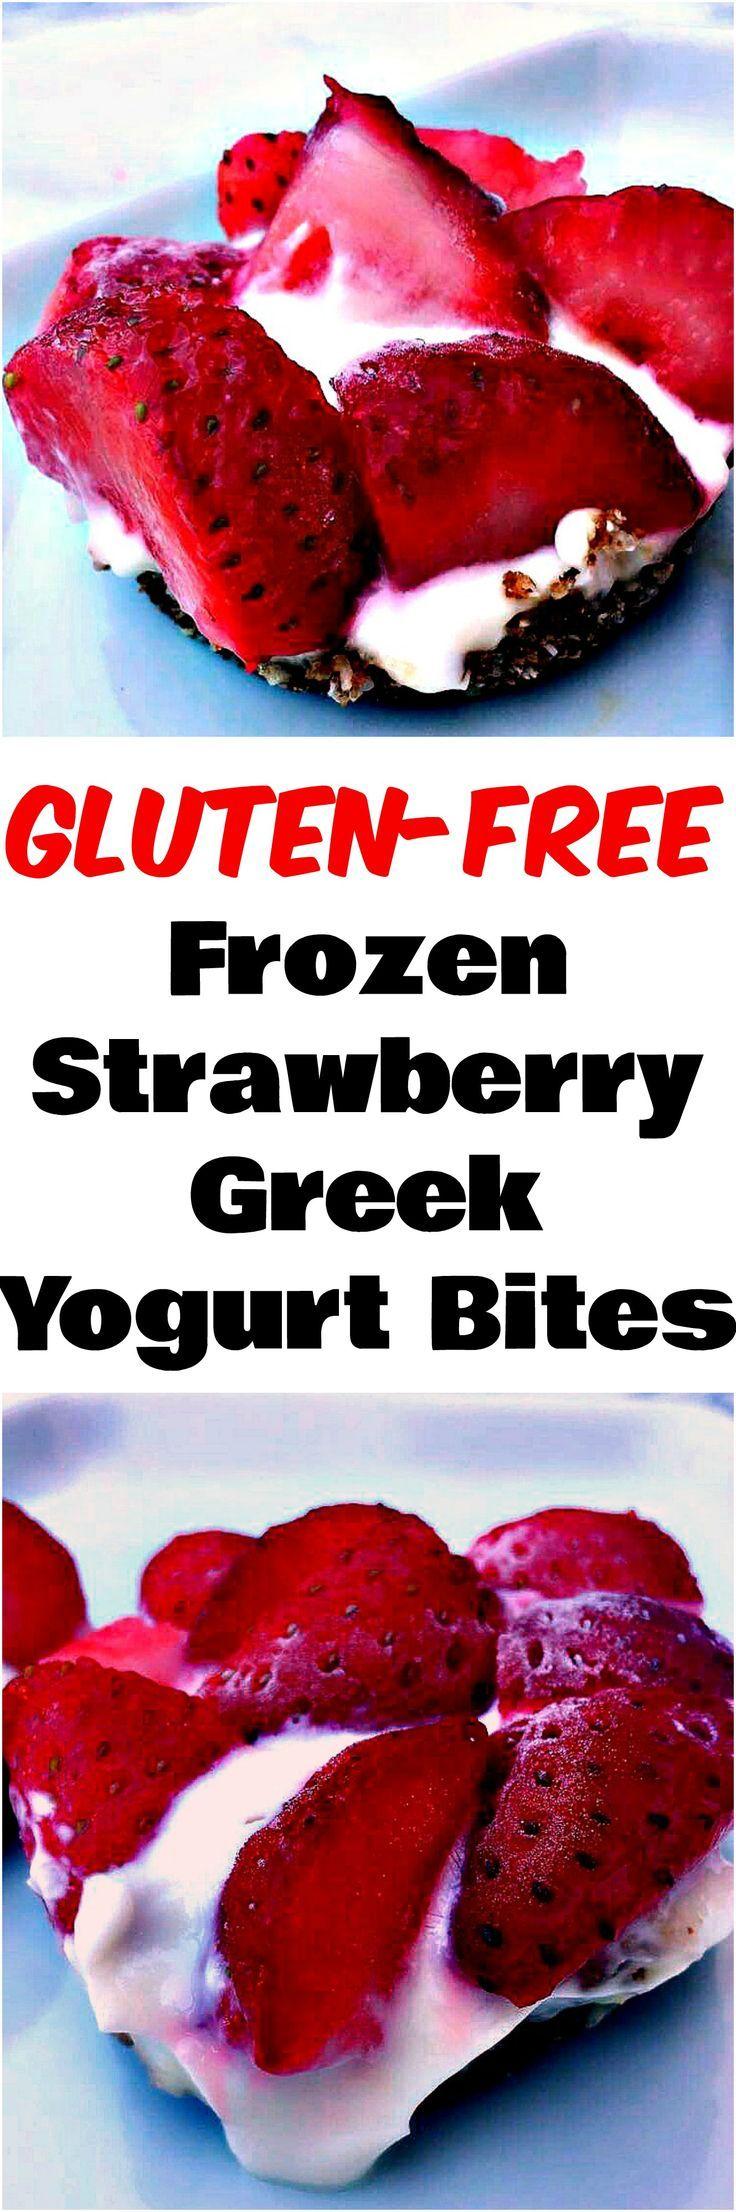 Gluten-Free Frozen Strawberry Greek Yogurt Bites make the perfect quick and easy low-calorie strawberry dessert.